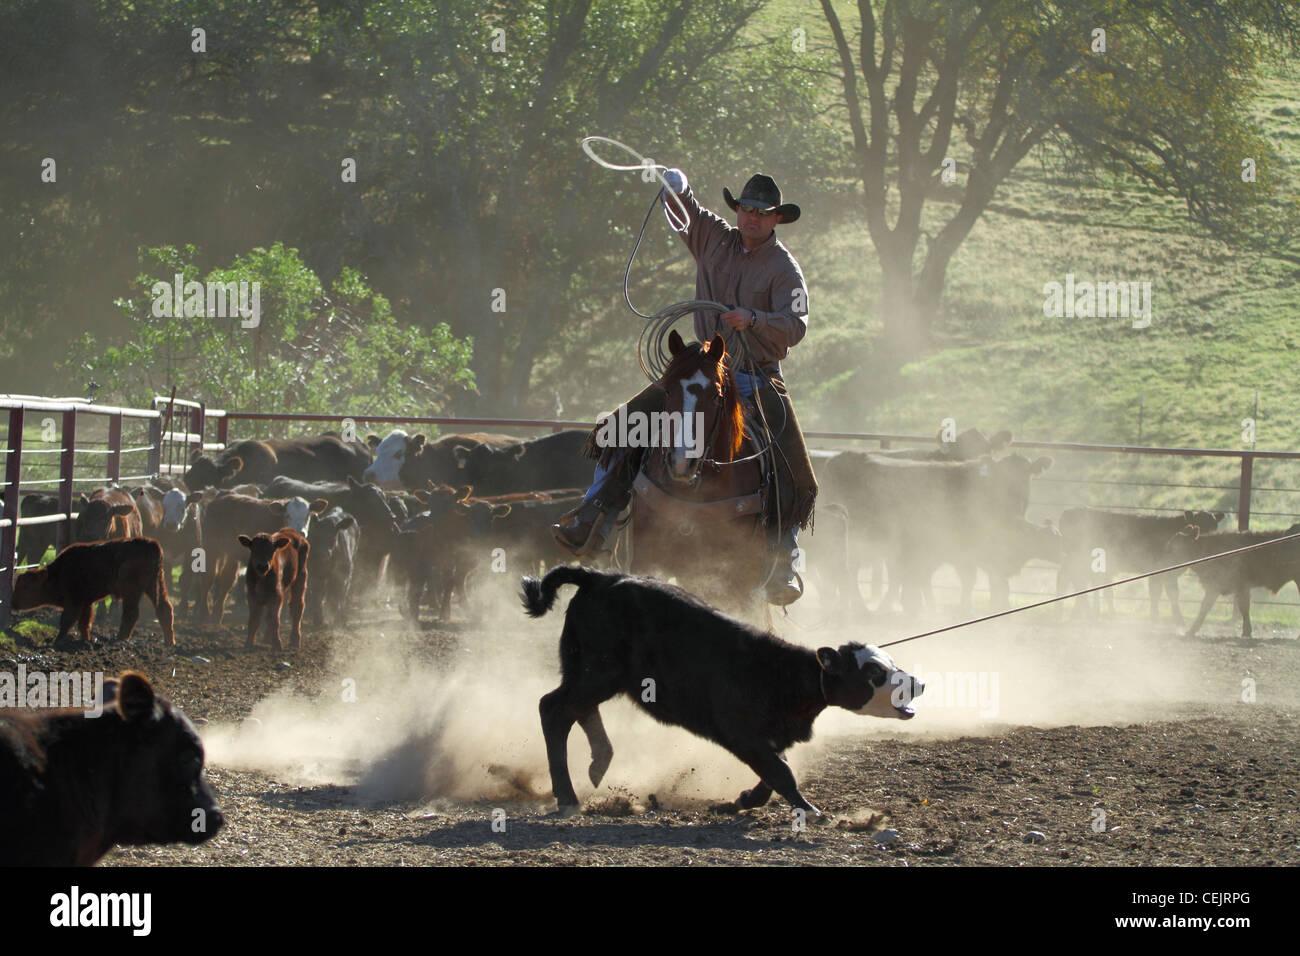 Cowboy Roping Horse Stock Photos Amp Cowboy Roping Horse